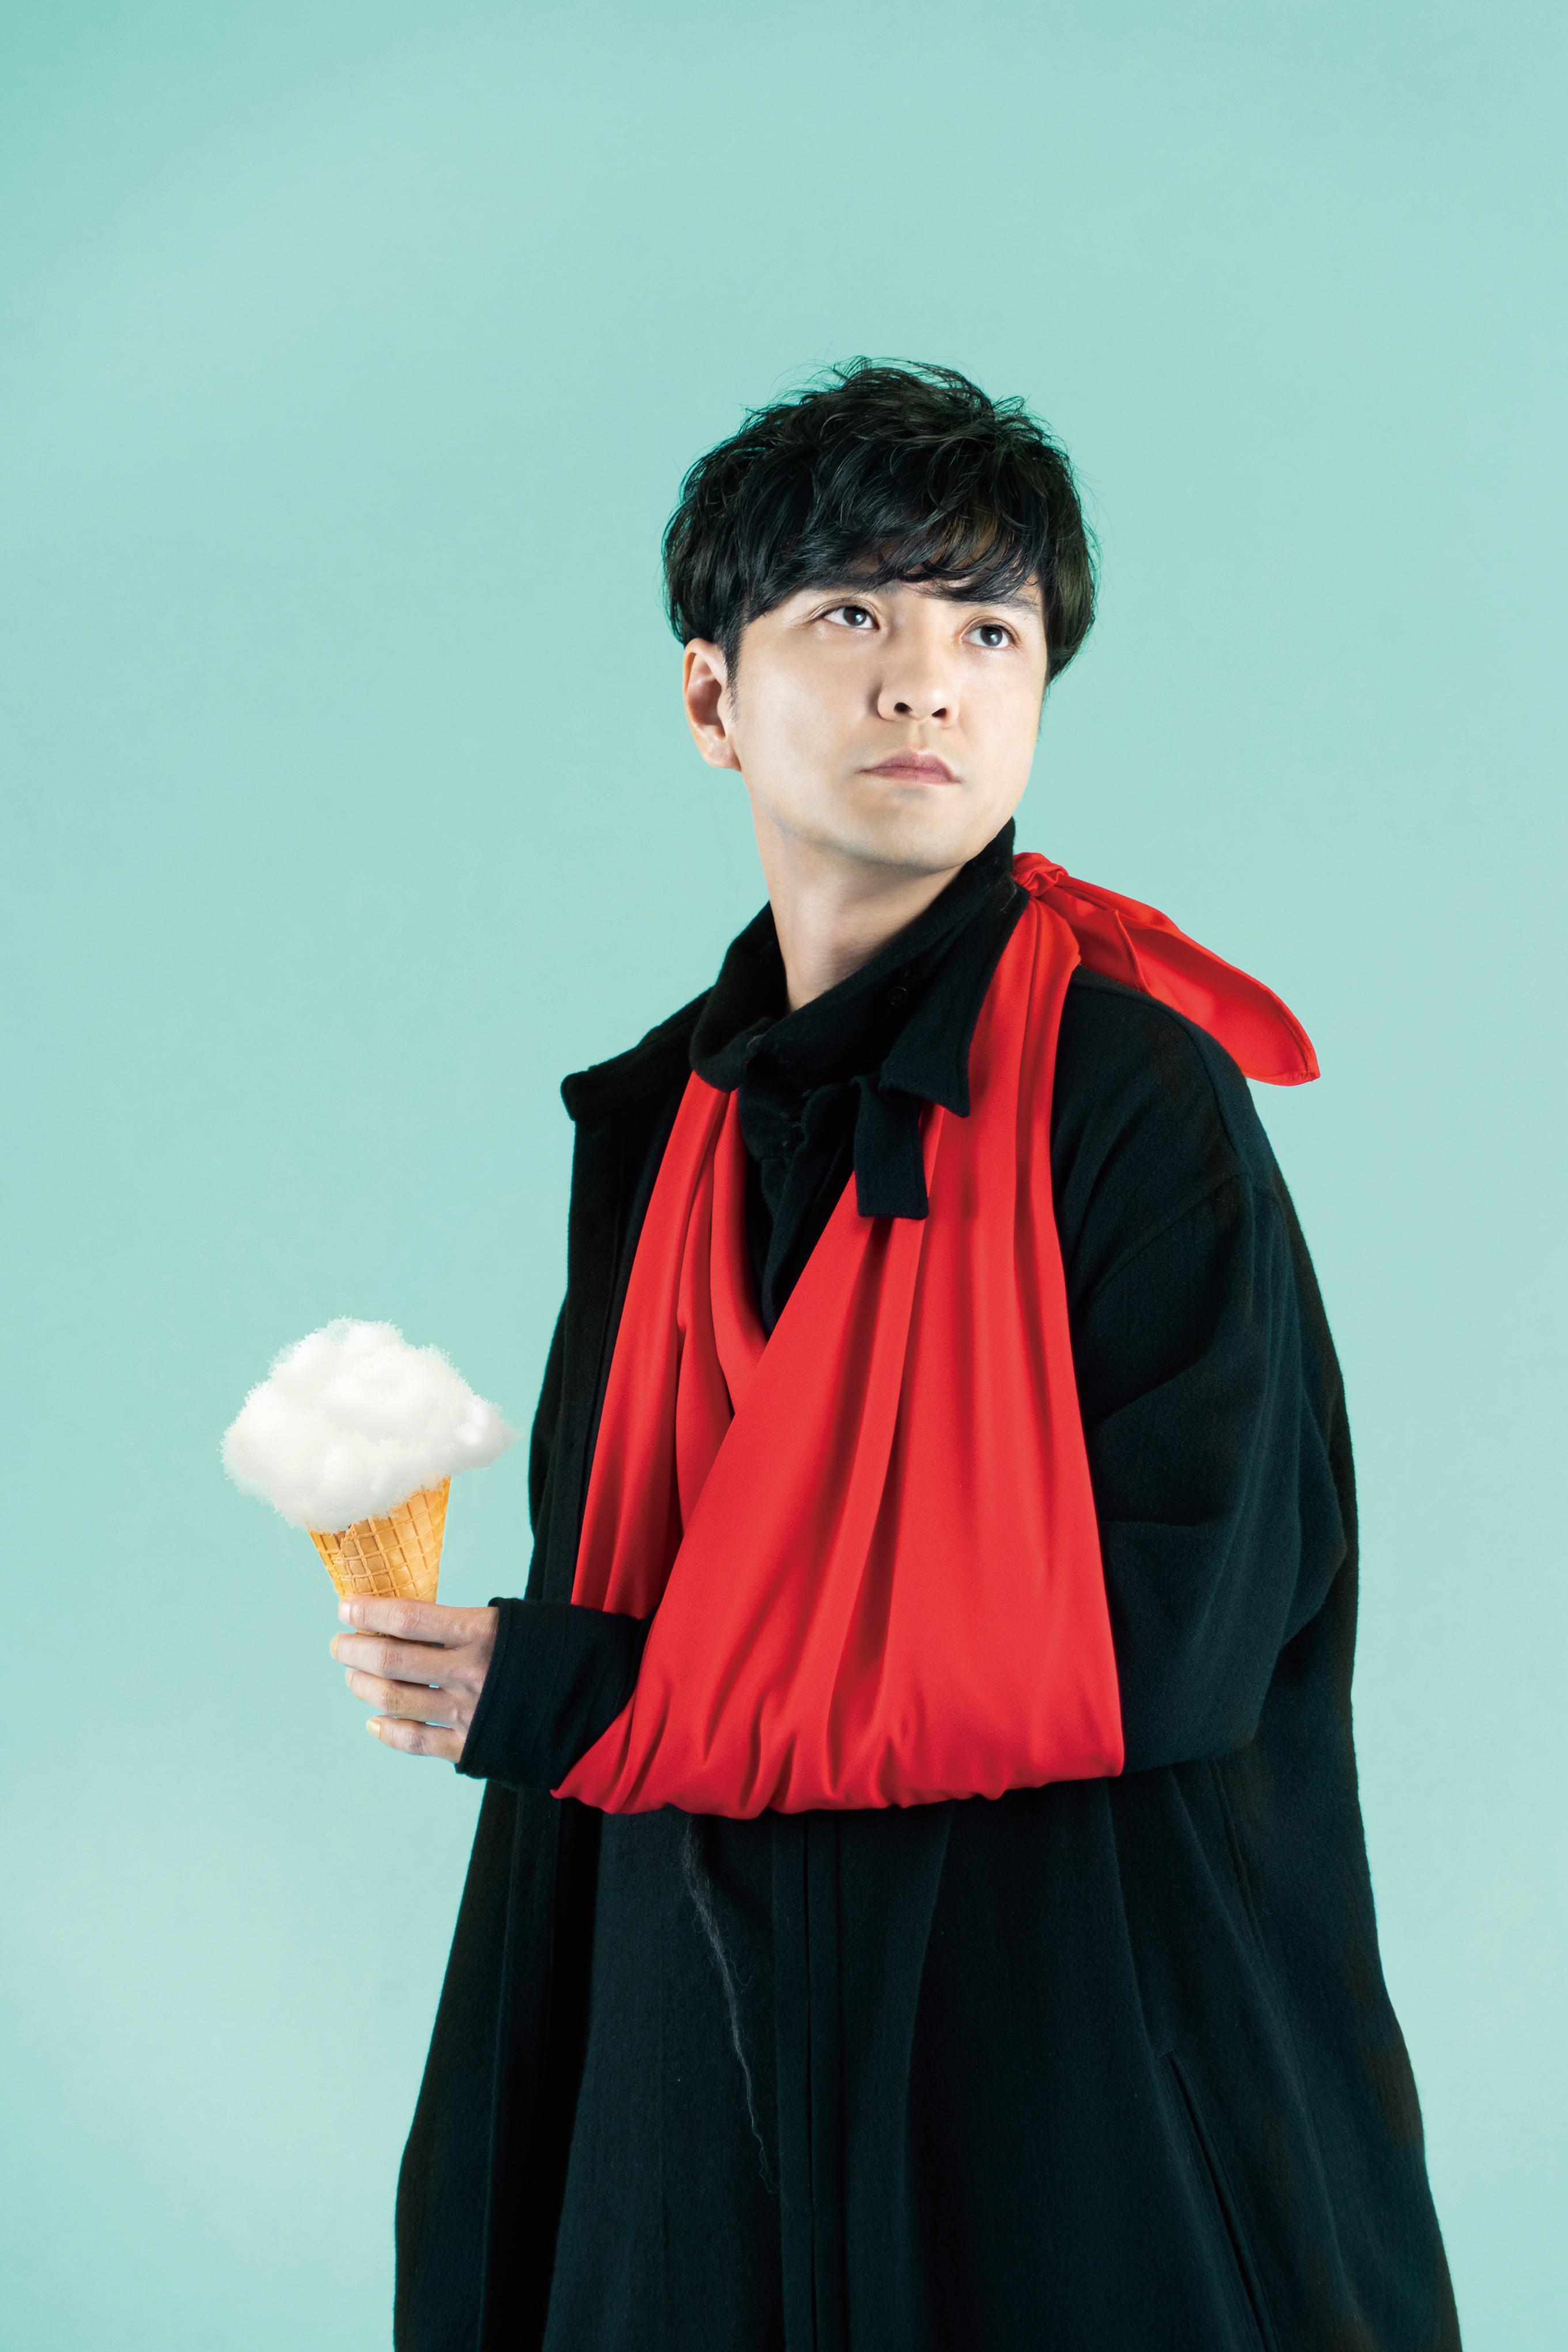 Moriyama Naotaro